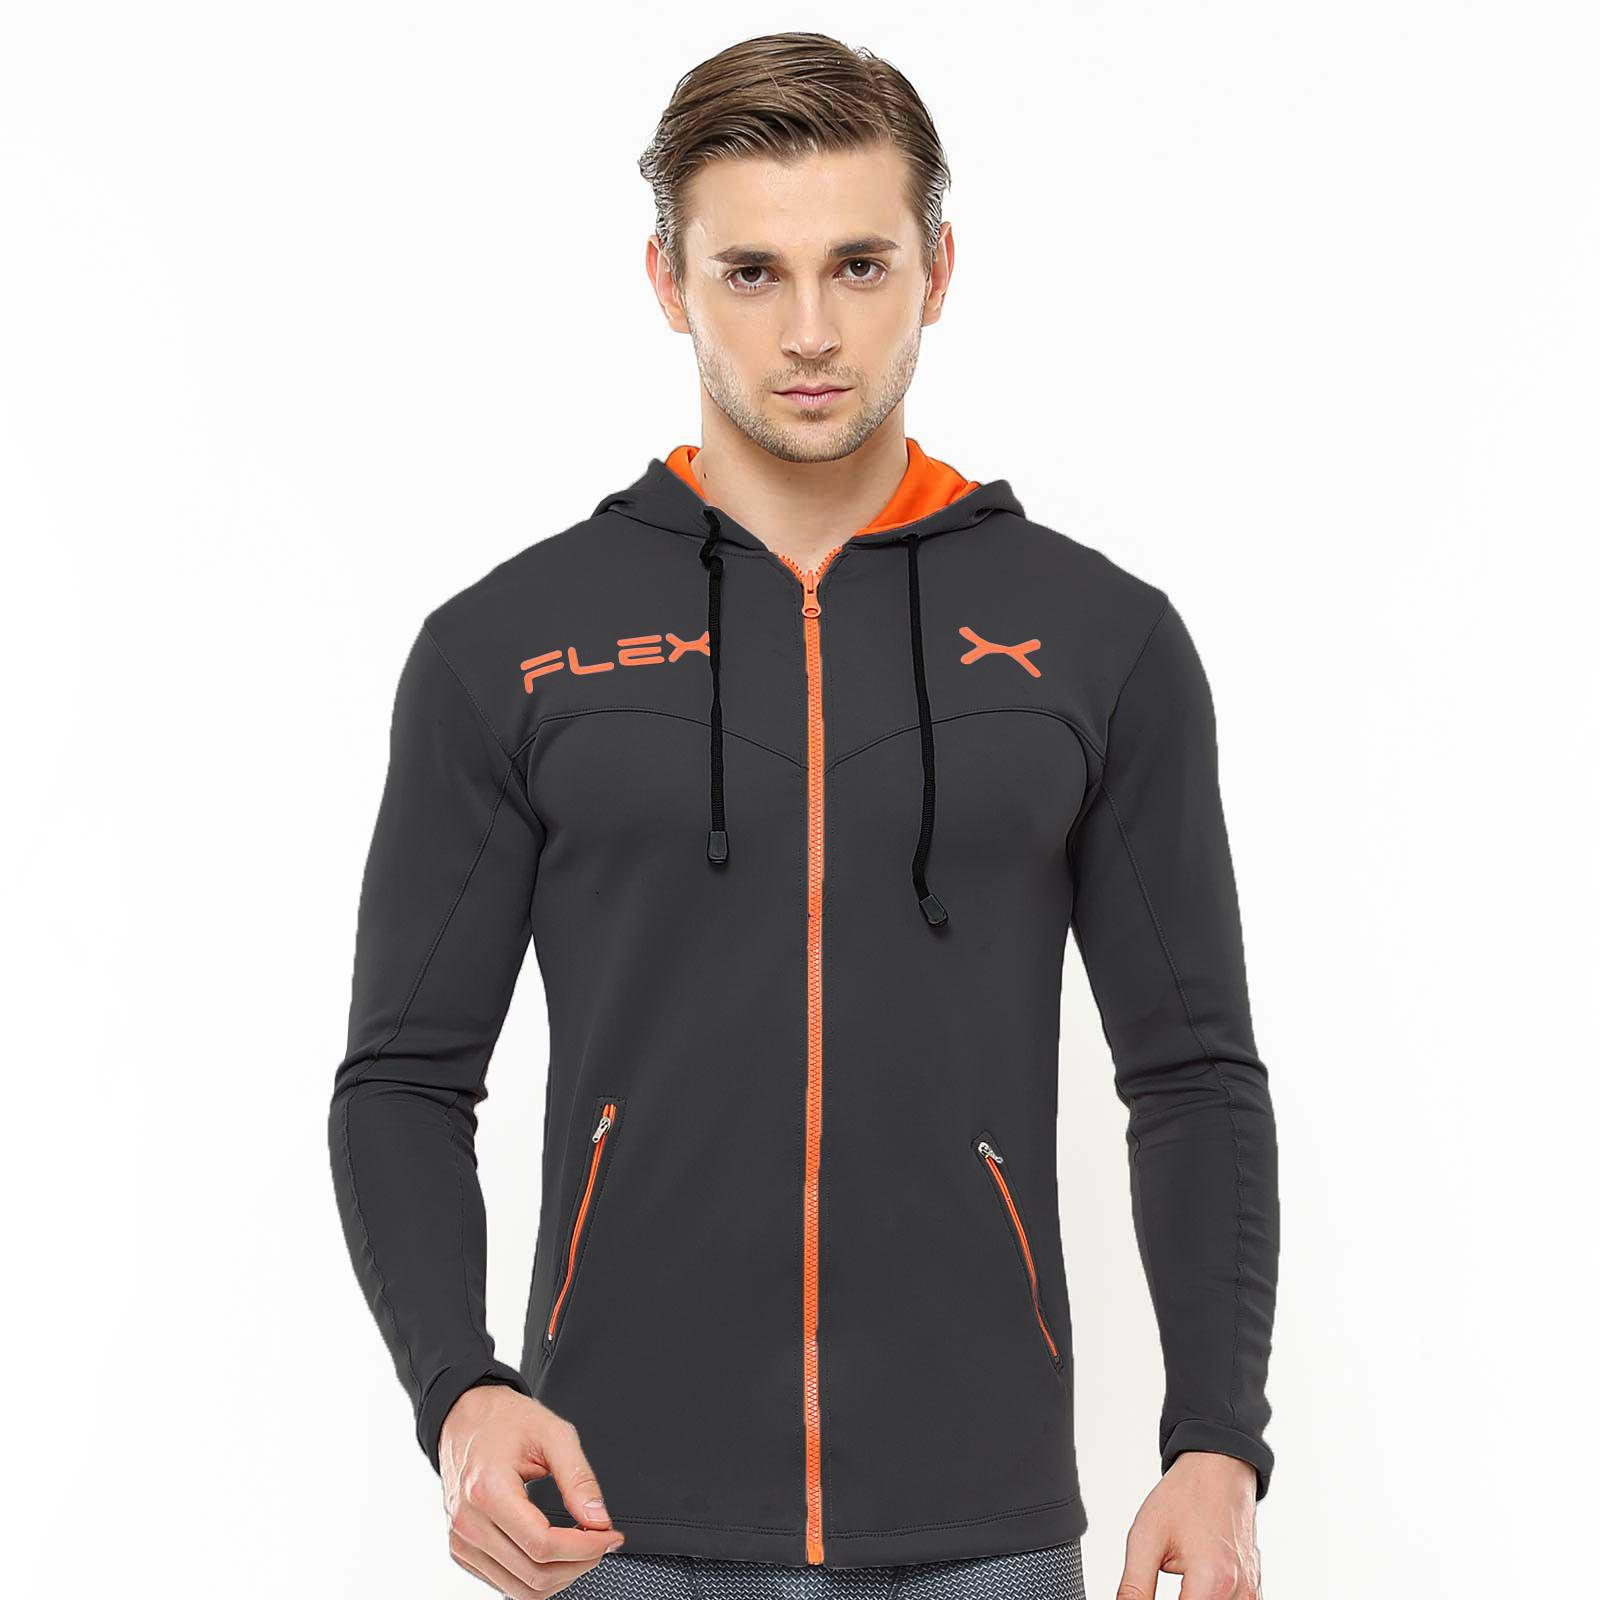 Jaket Olahraga Hoodie FJS-002 Durable Sport Intensive Gym Fitness Jogging  Lari 9103babcfe